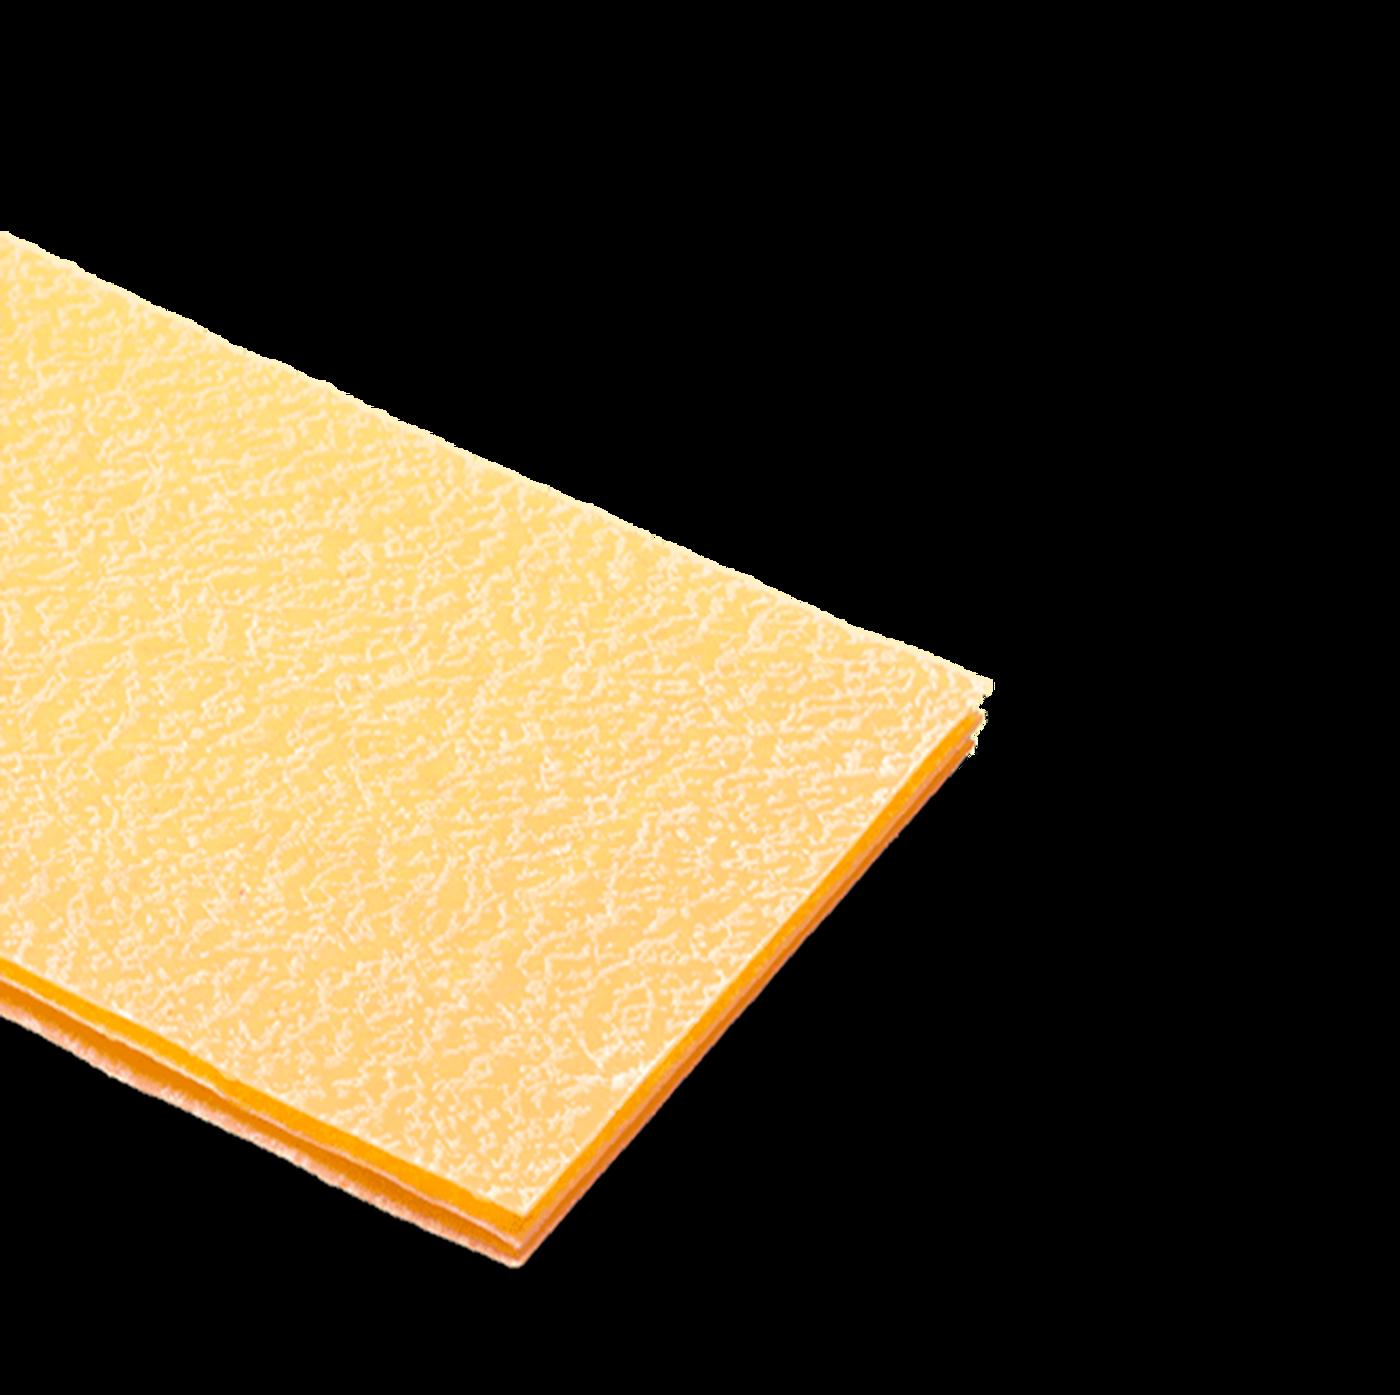 Lasagna All'uovo N.112